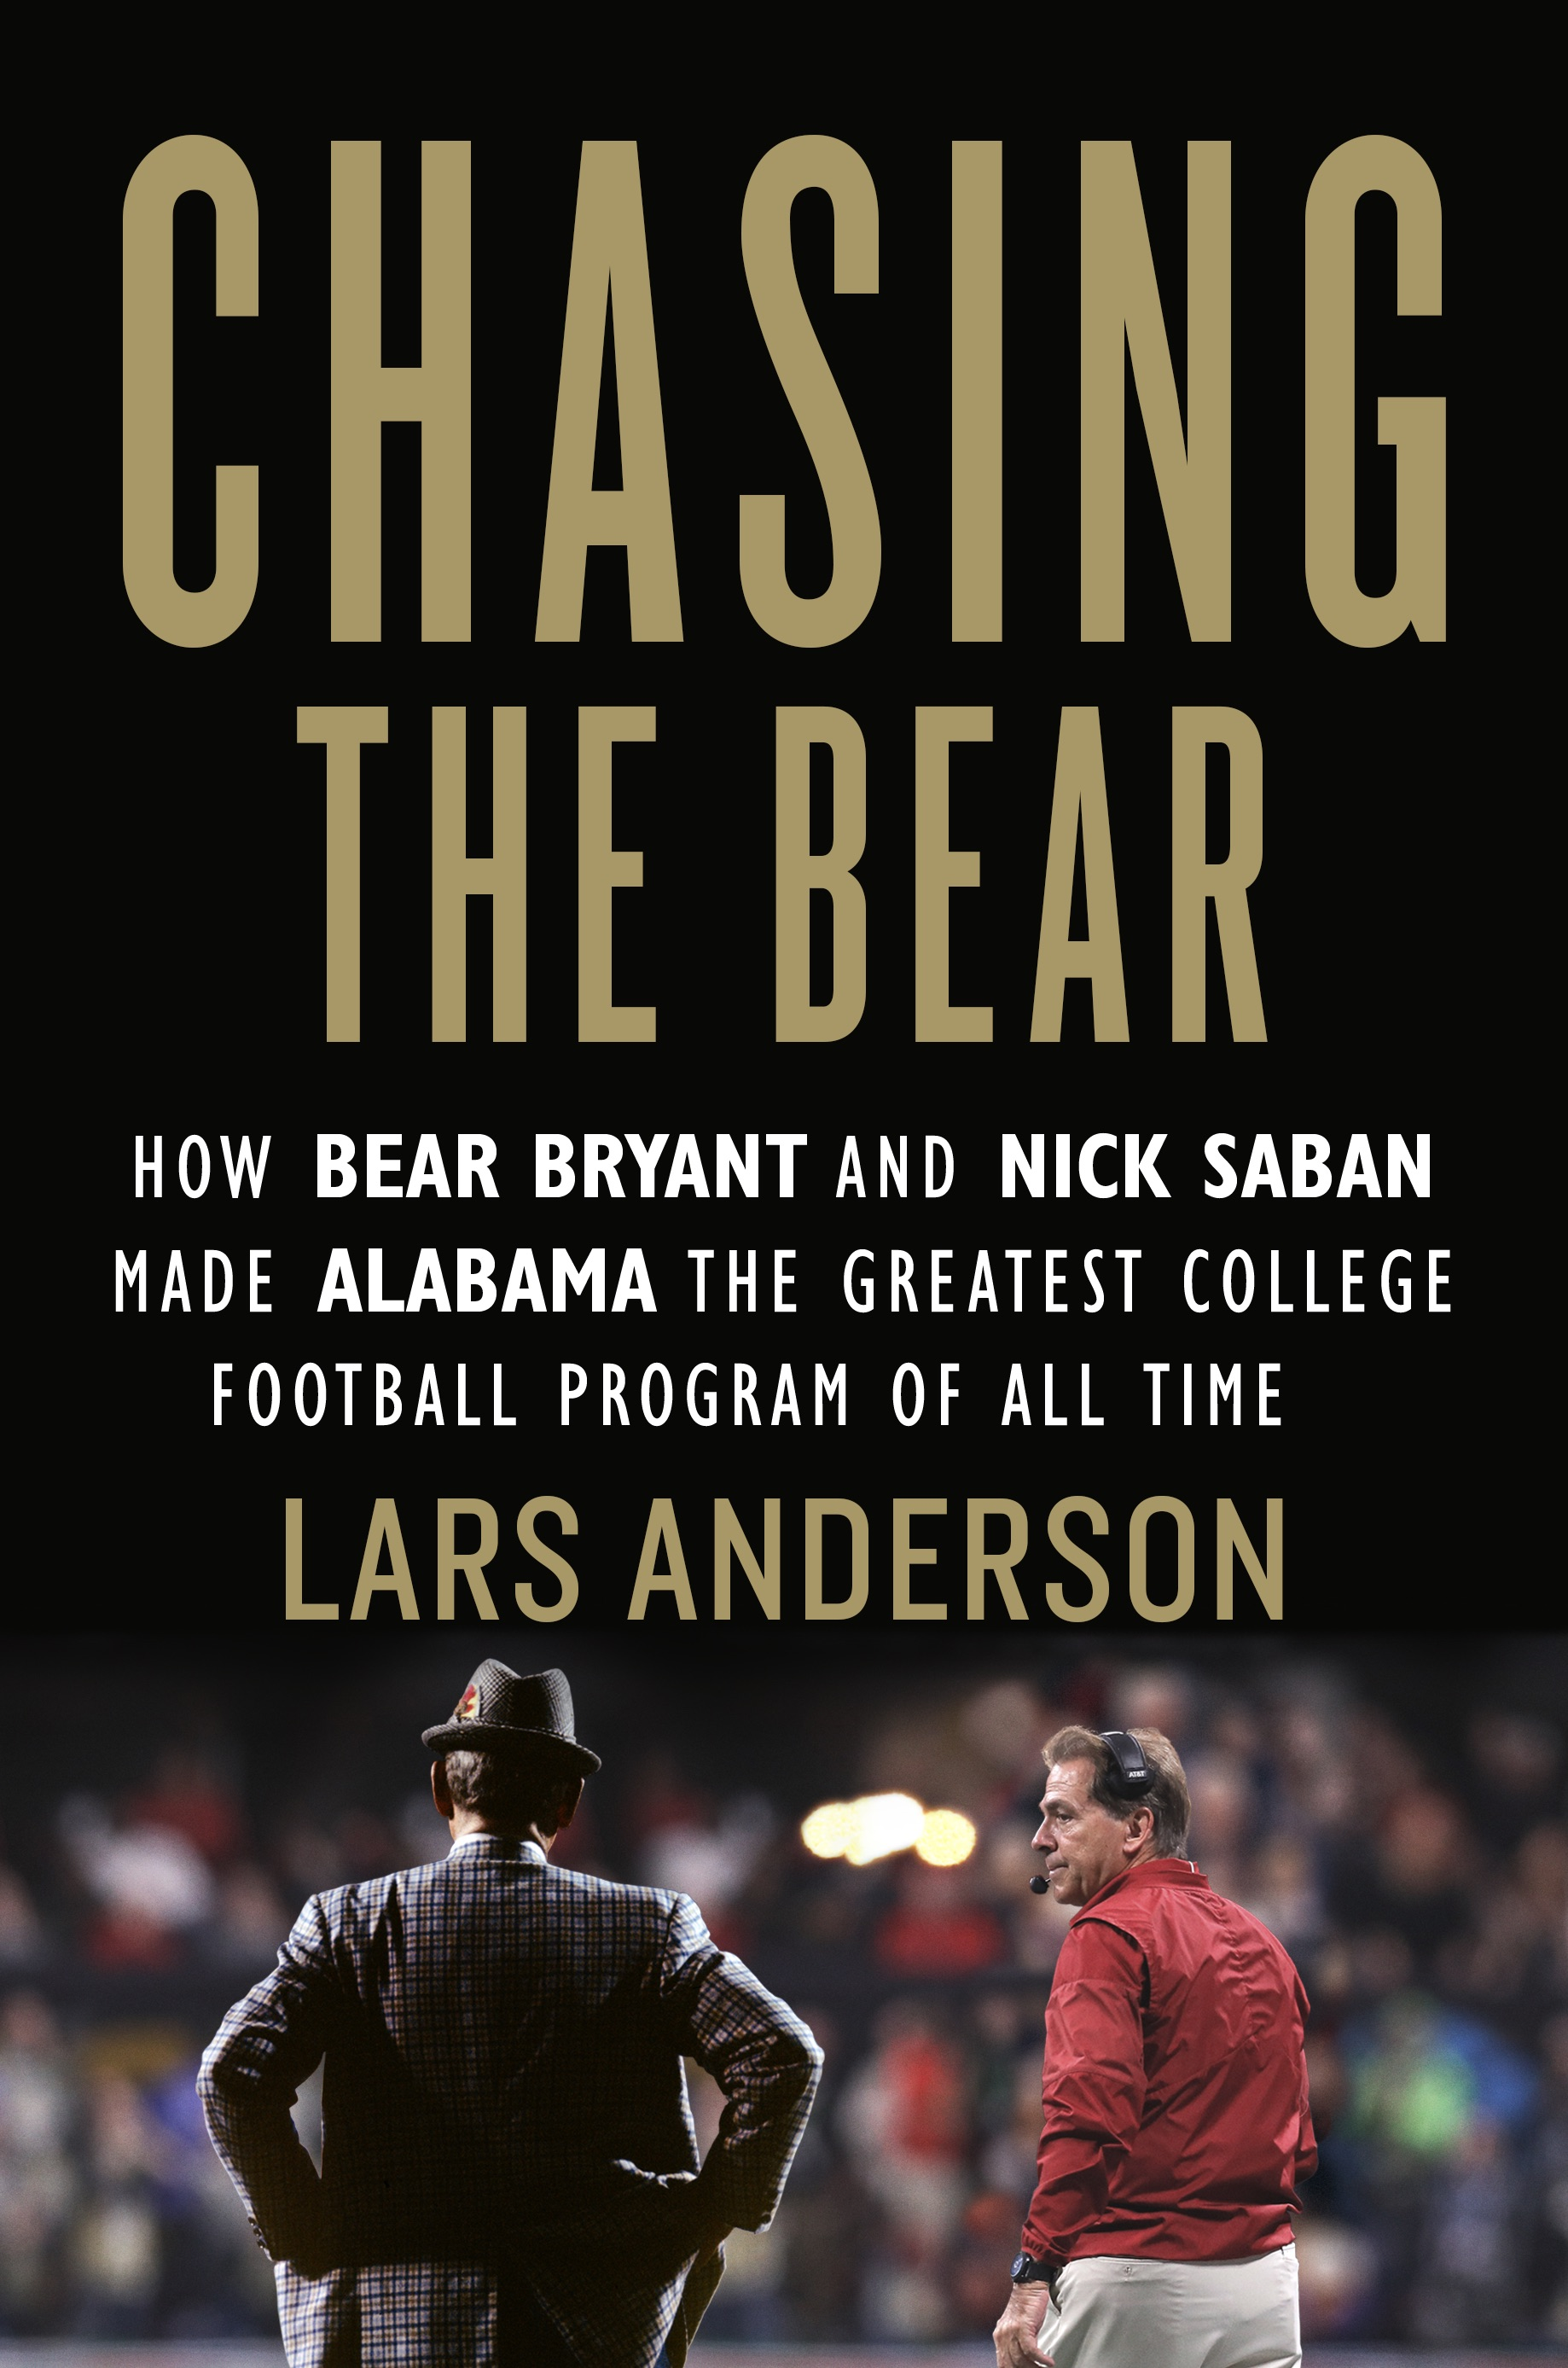 Chasing the Bear by Lars Anderson hit shelves on September 3rd.